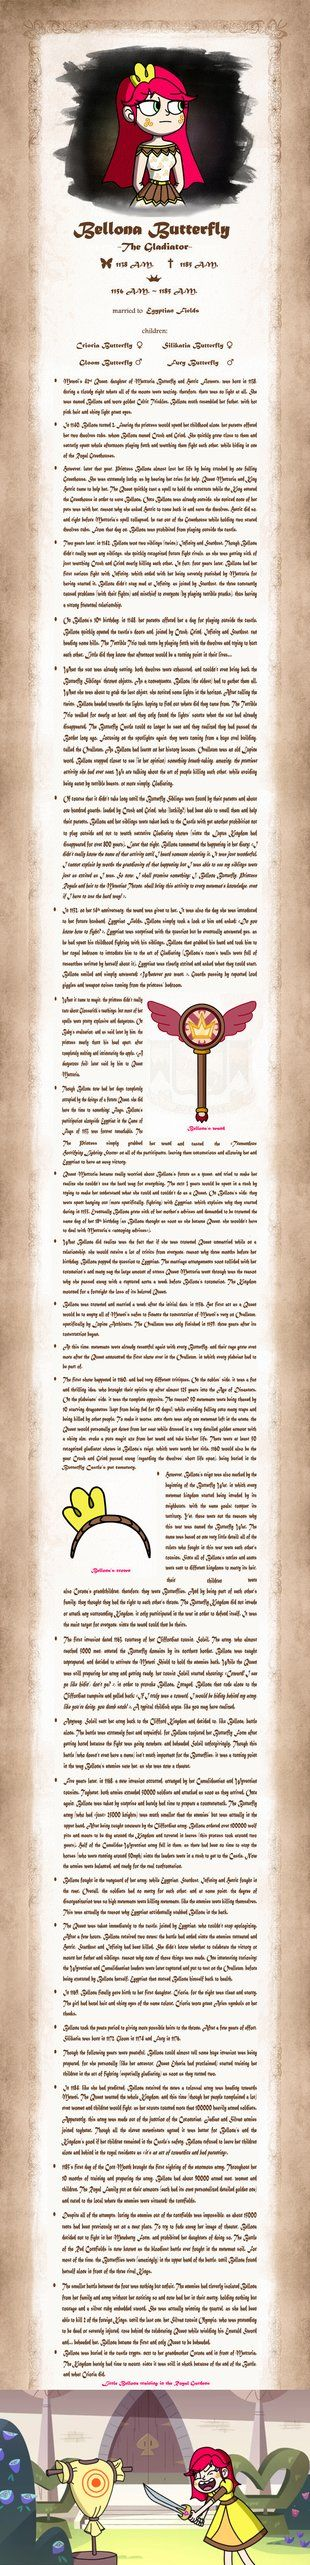 Bellona The Gladiator's Biography by Shyhobbistdrawer31